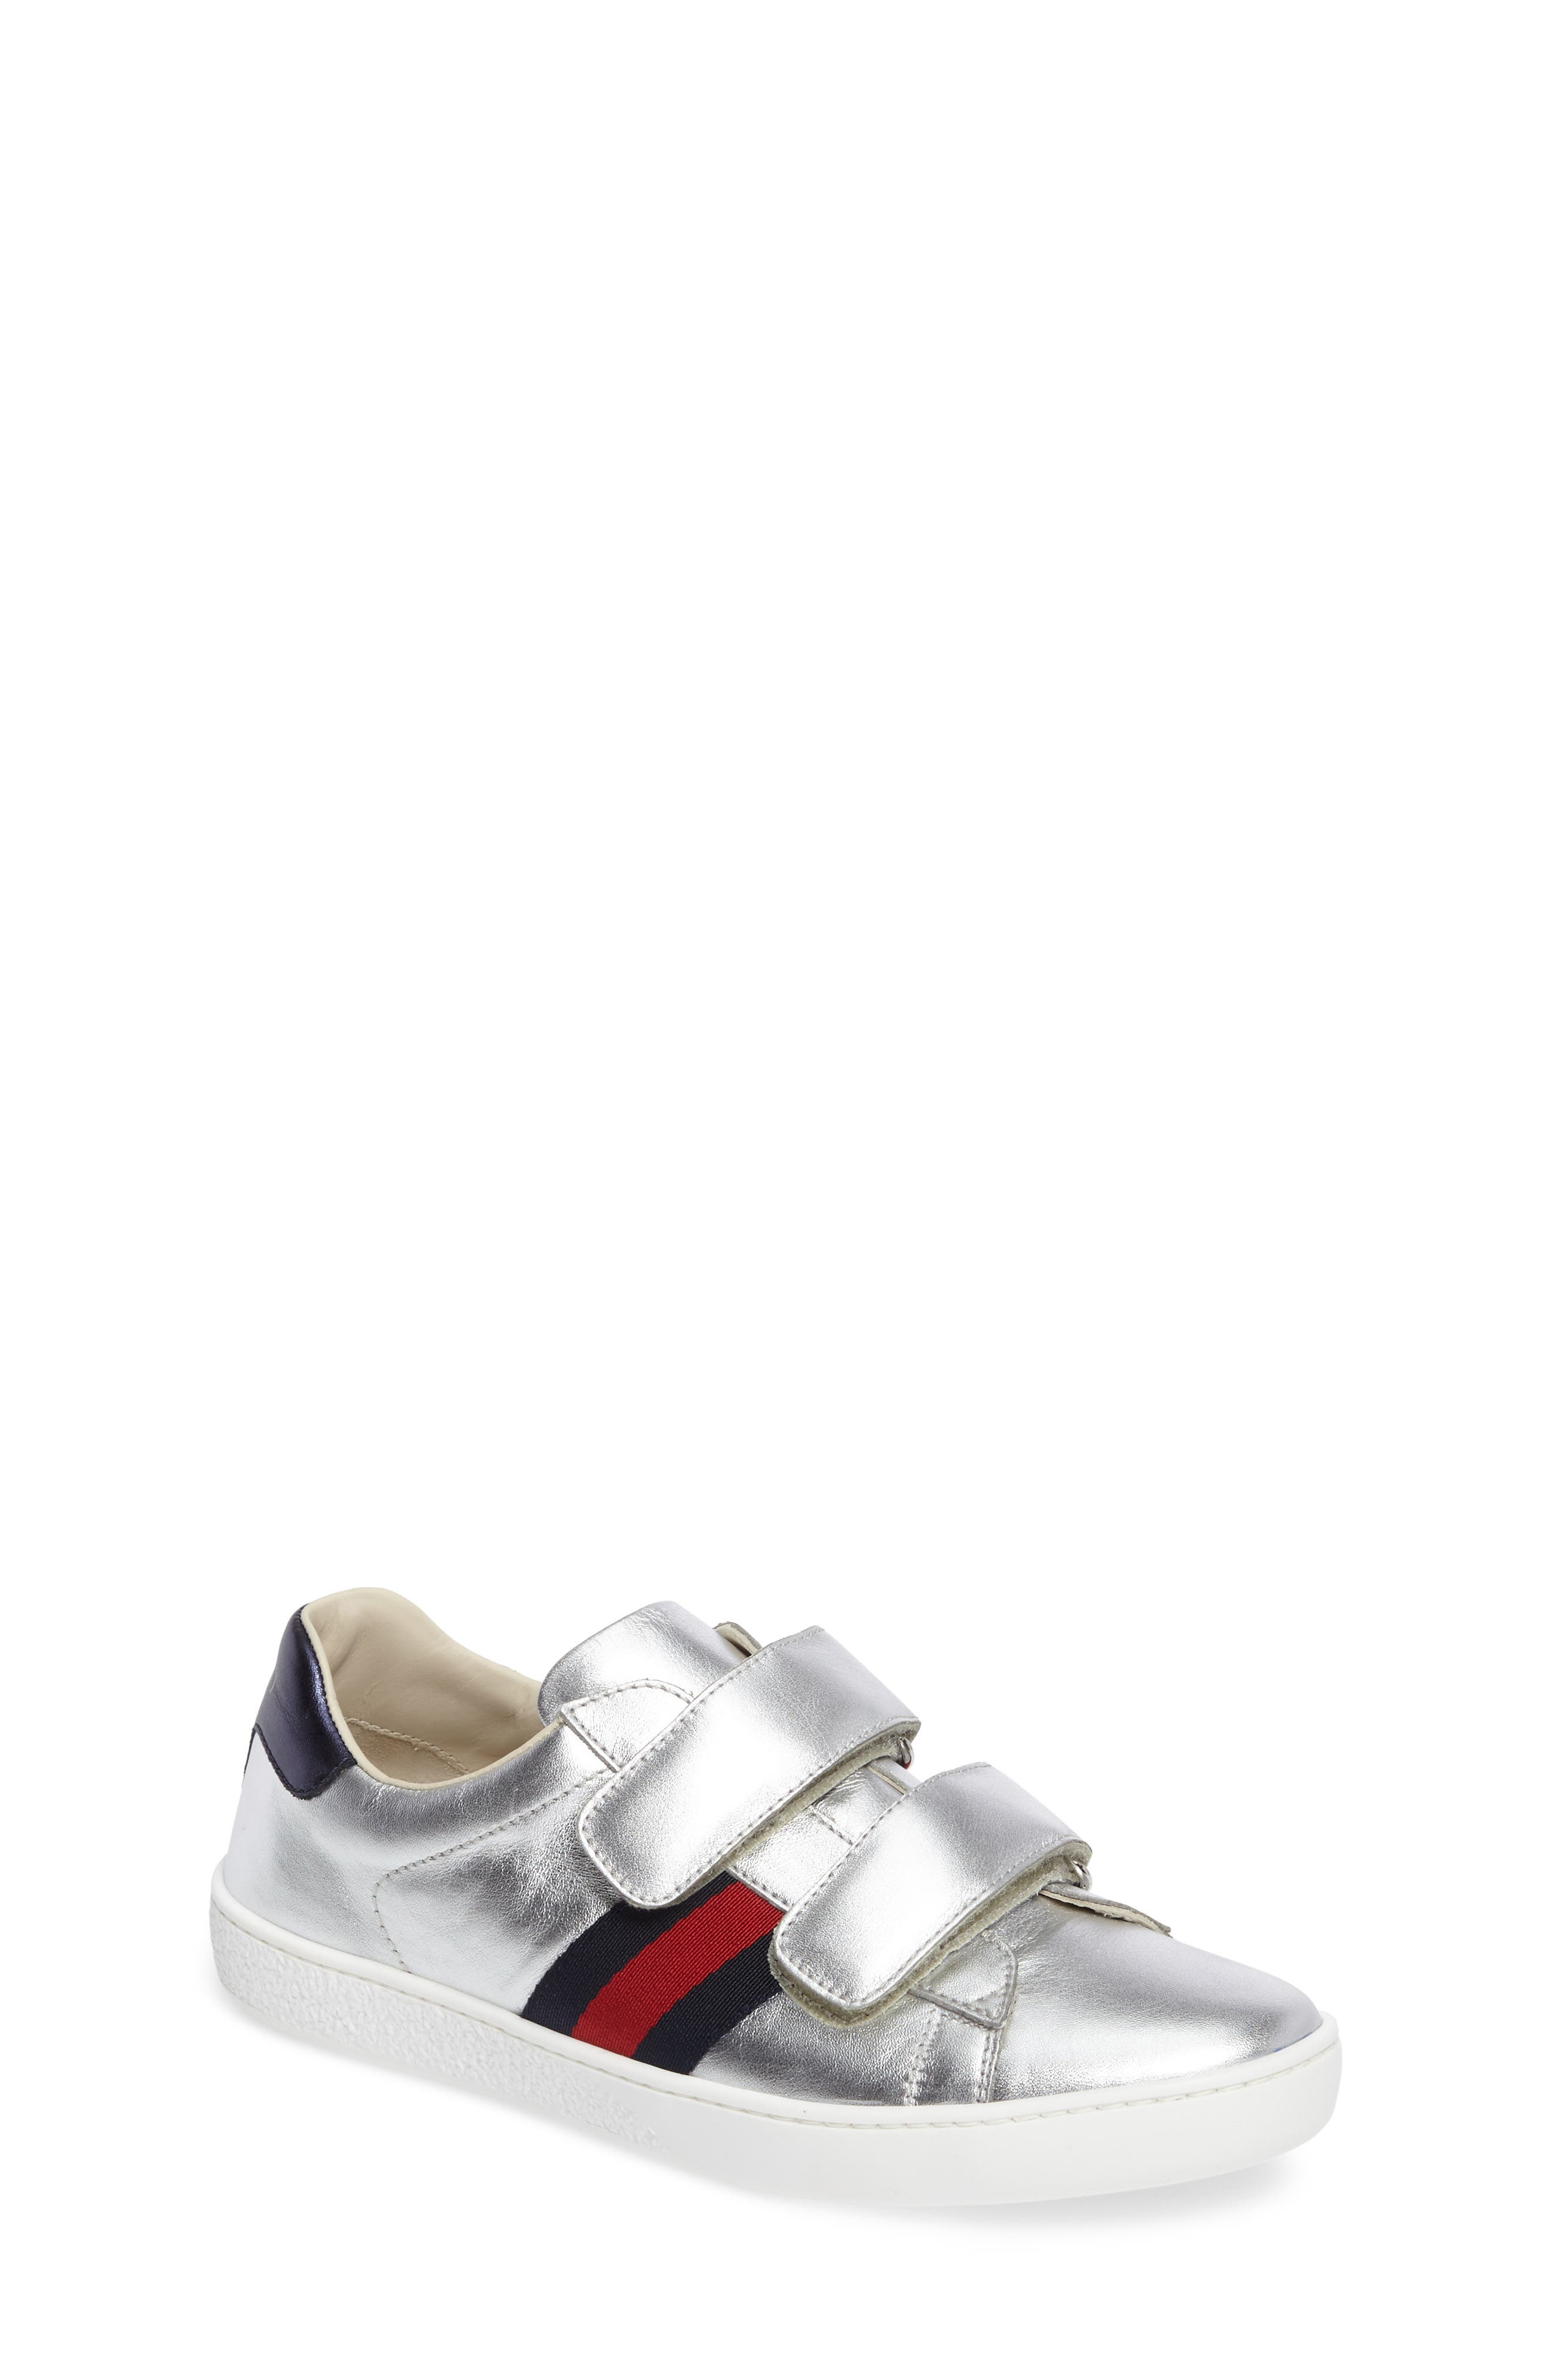 Kids Gucci New Ace Sneaker Size 5US  37EU  Metallic